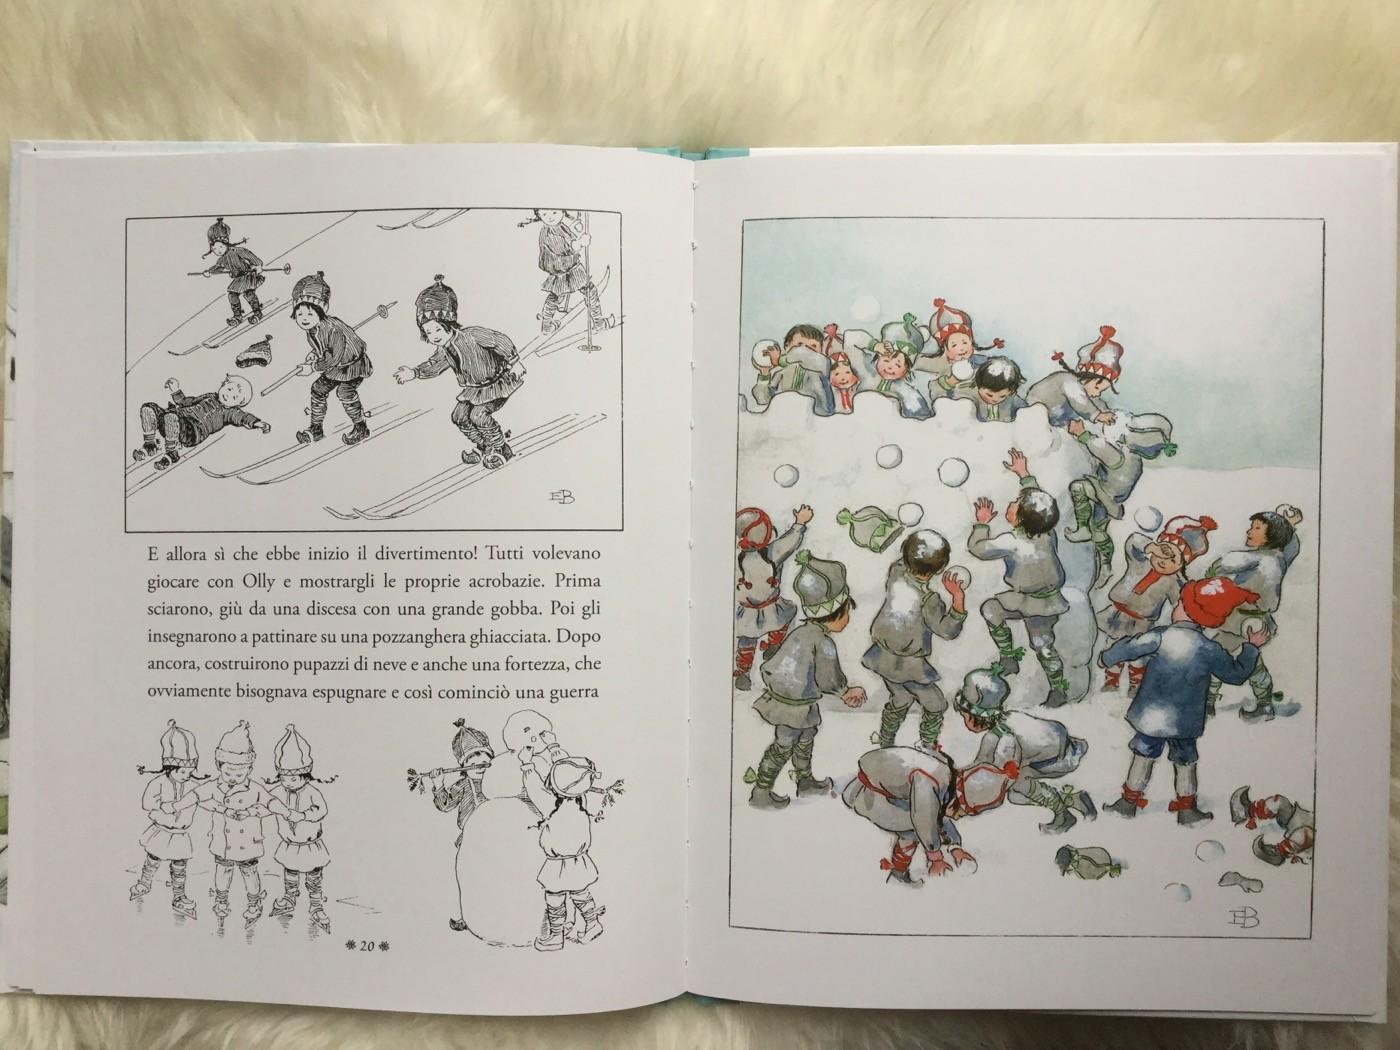 OLLY VA A SCIARE Elsa Beskow LO Editions